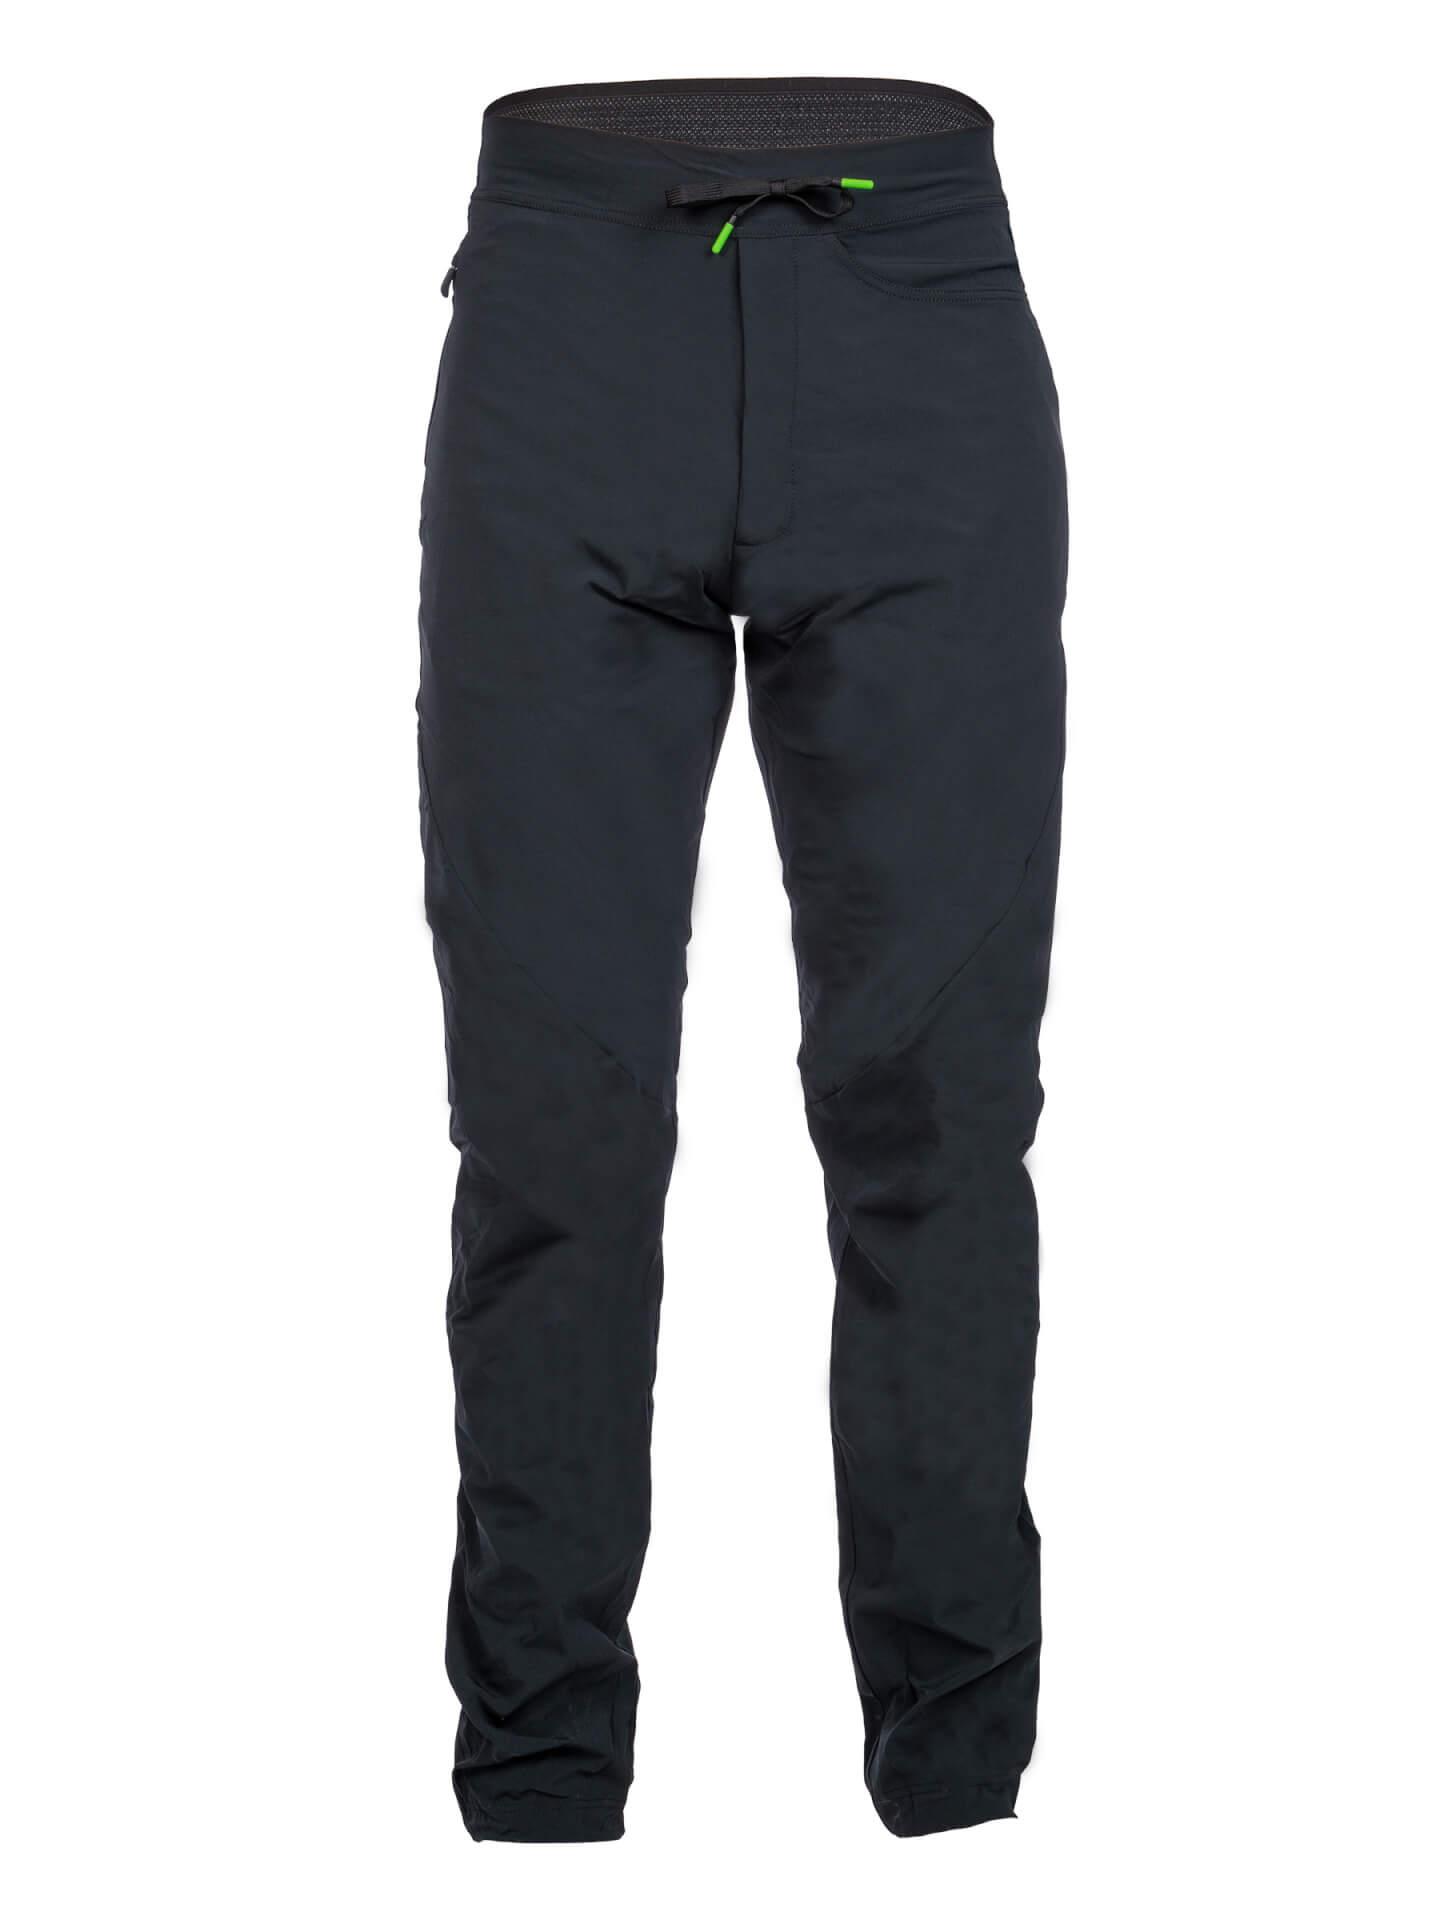 men's active trousers - premium activerwear